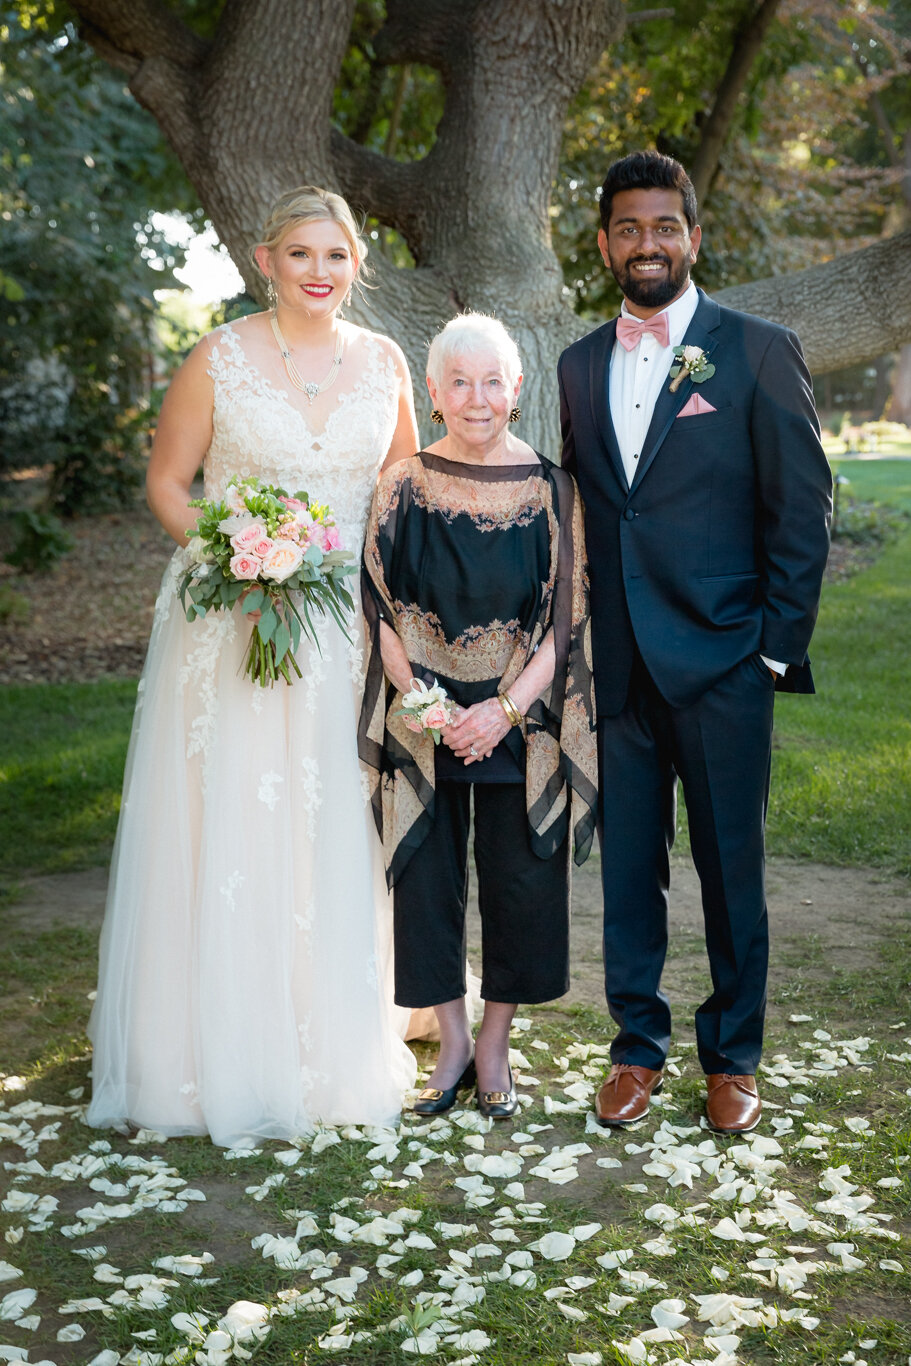 2019.08.24_Emily-Ashir-Wedding-at-the-Maples-6018.jpg